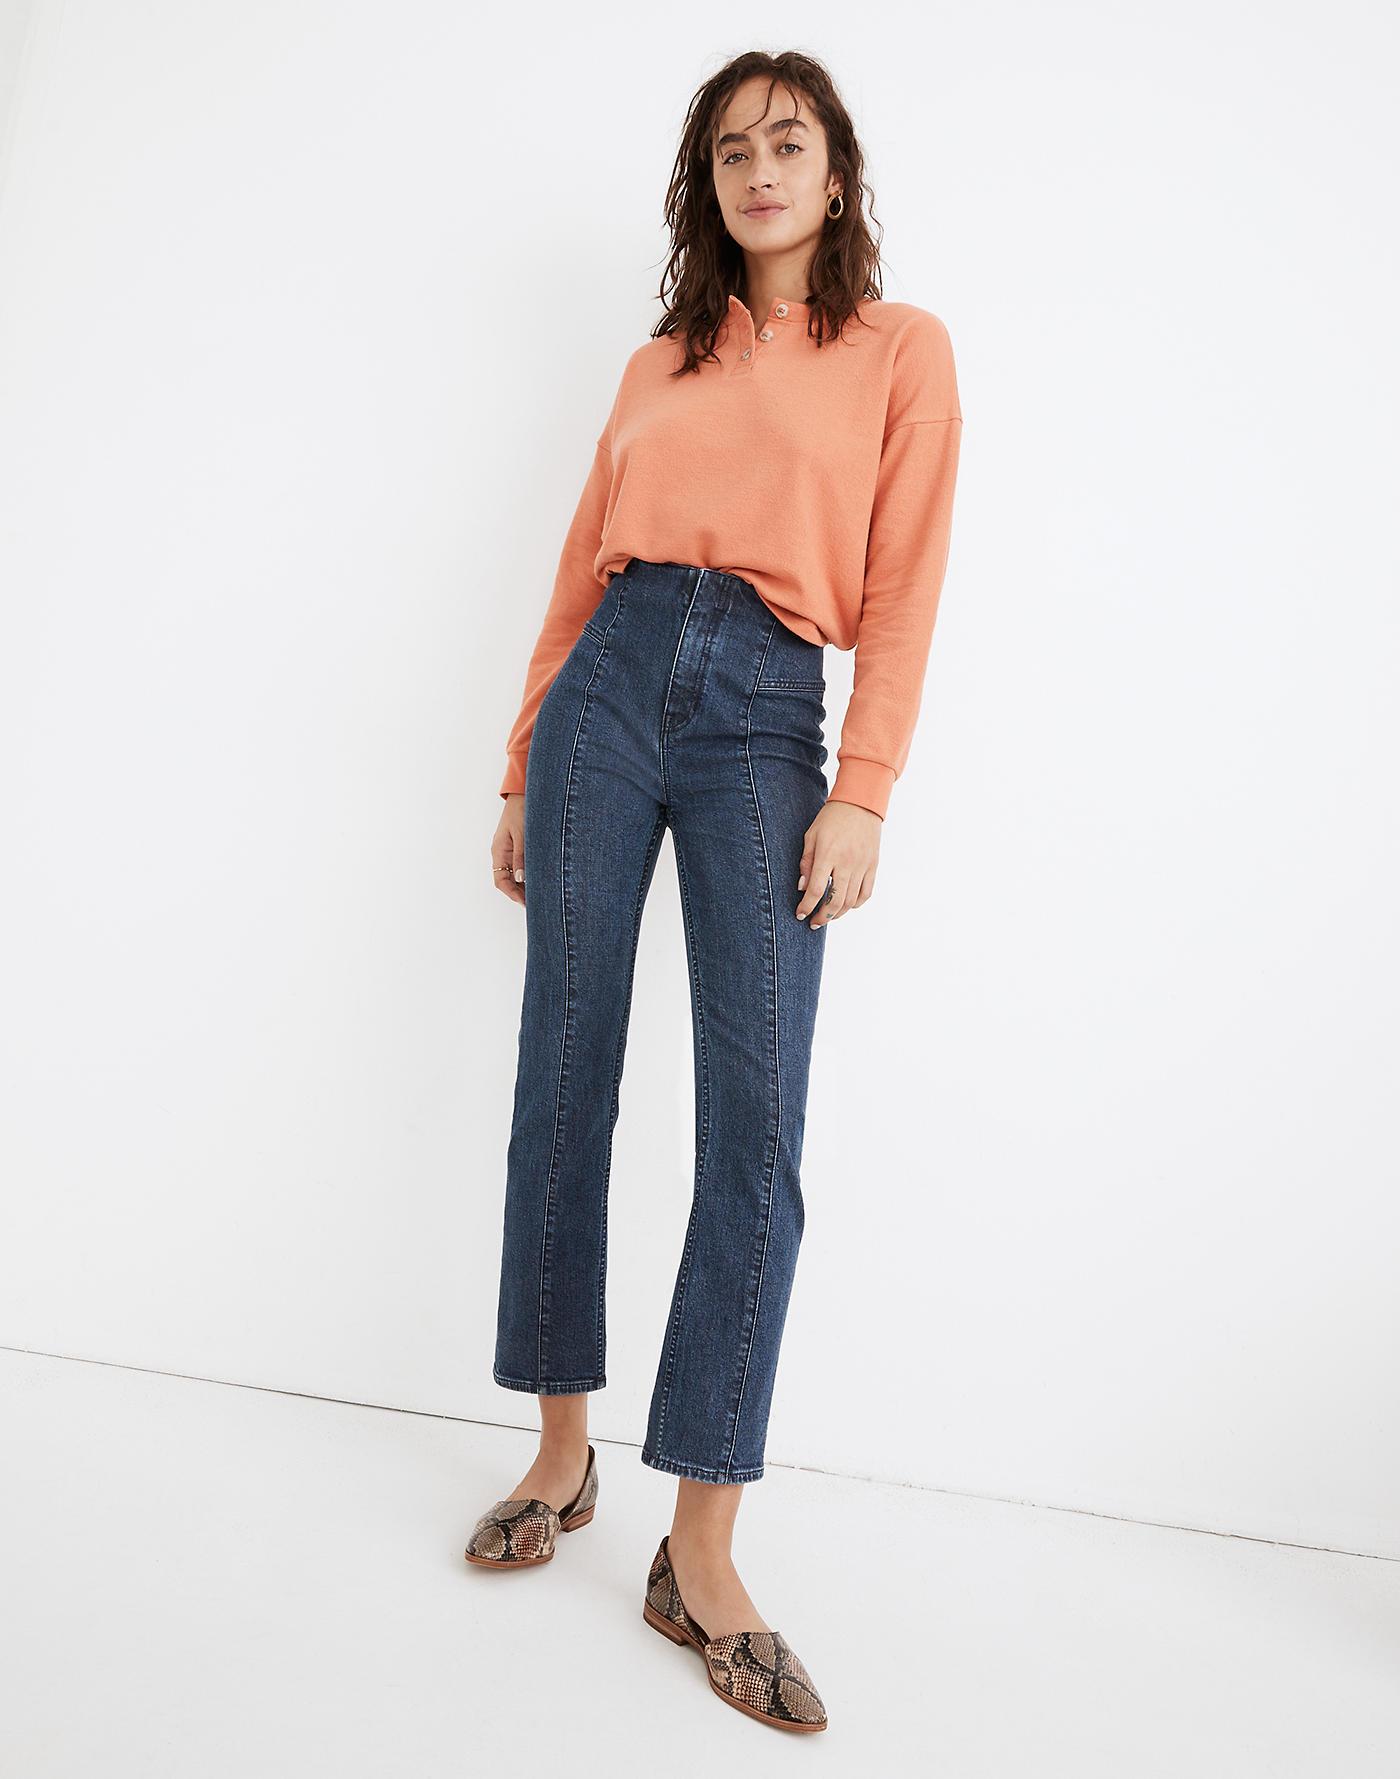 Madewell Slim Demi-Boot Jeans in Reyes Wash: Seamed TENCEL Denim Edition